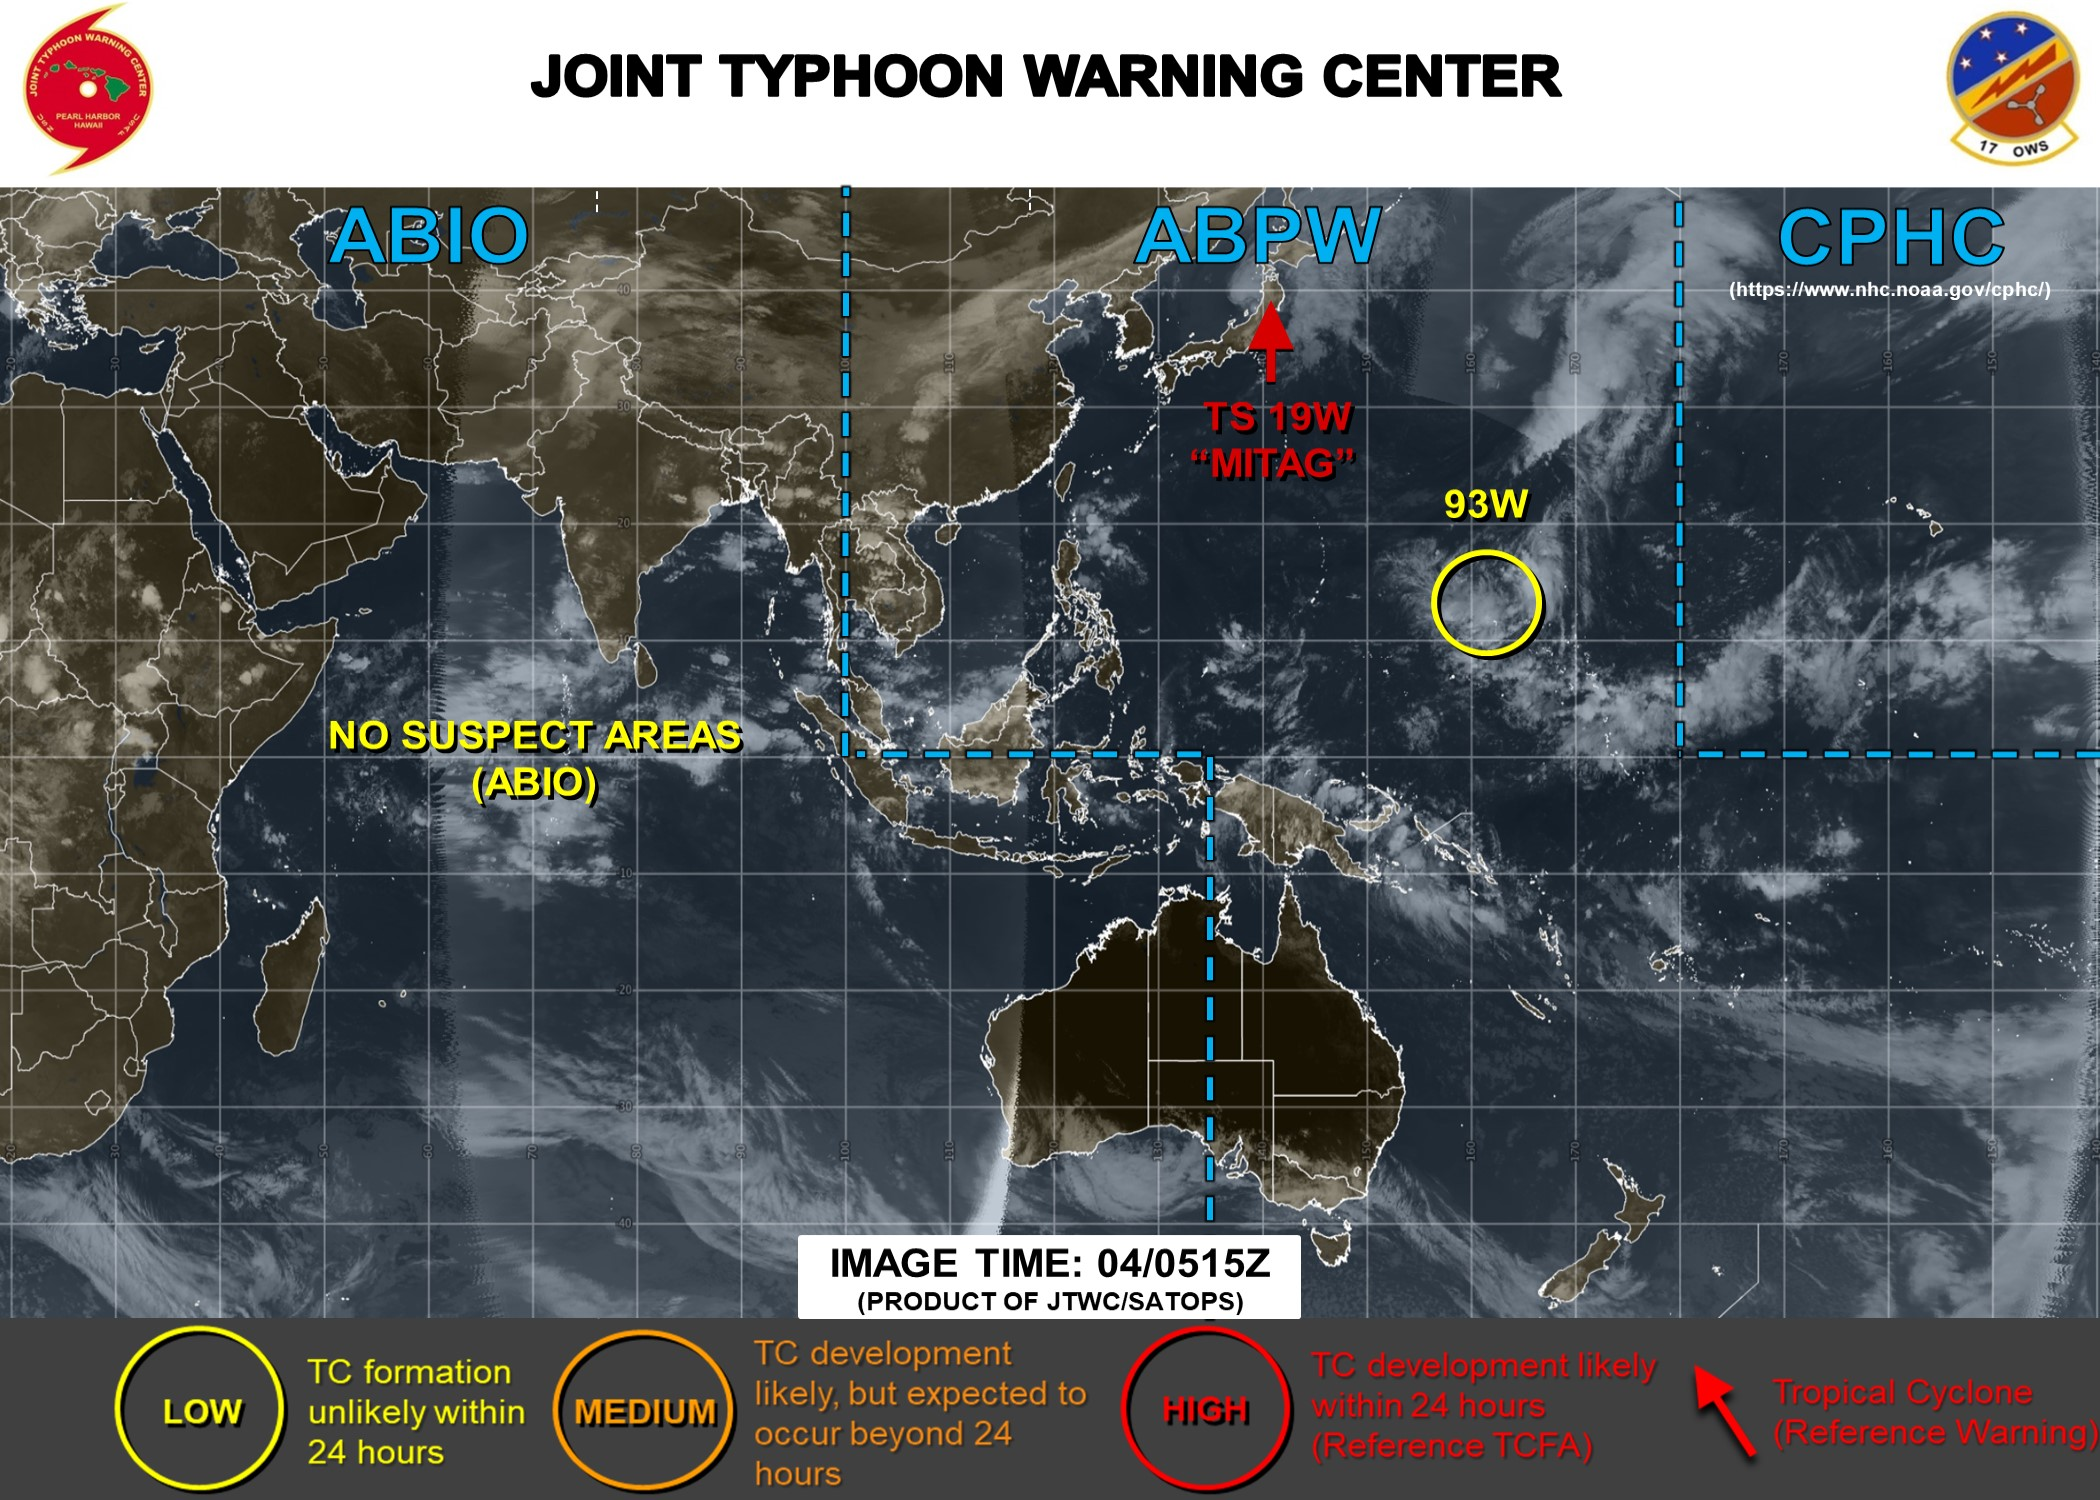 Invest 93W east of Guam: LOW.  Mitag(19W): JMV File. Peak intensity was 90kts(cat 2)